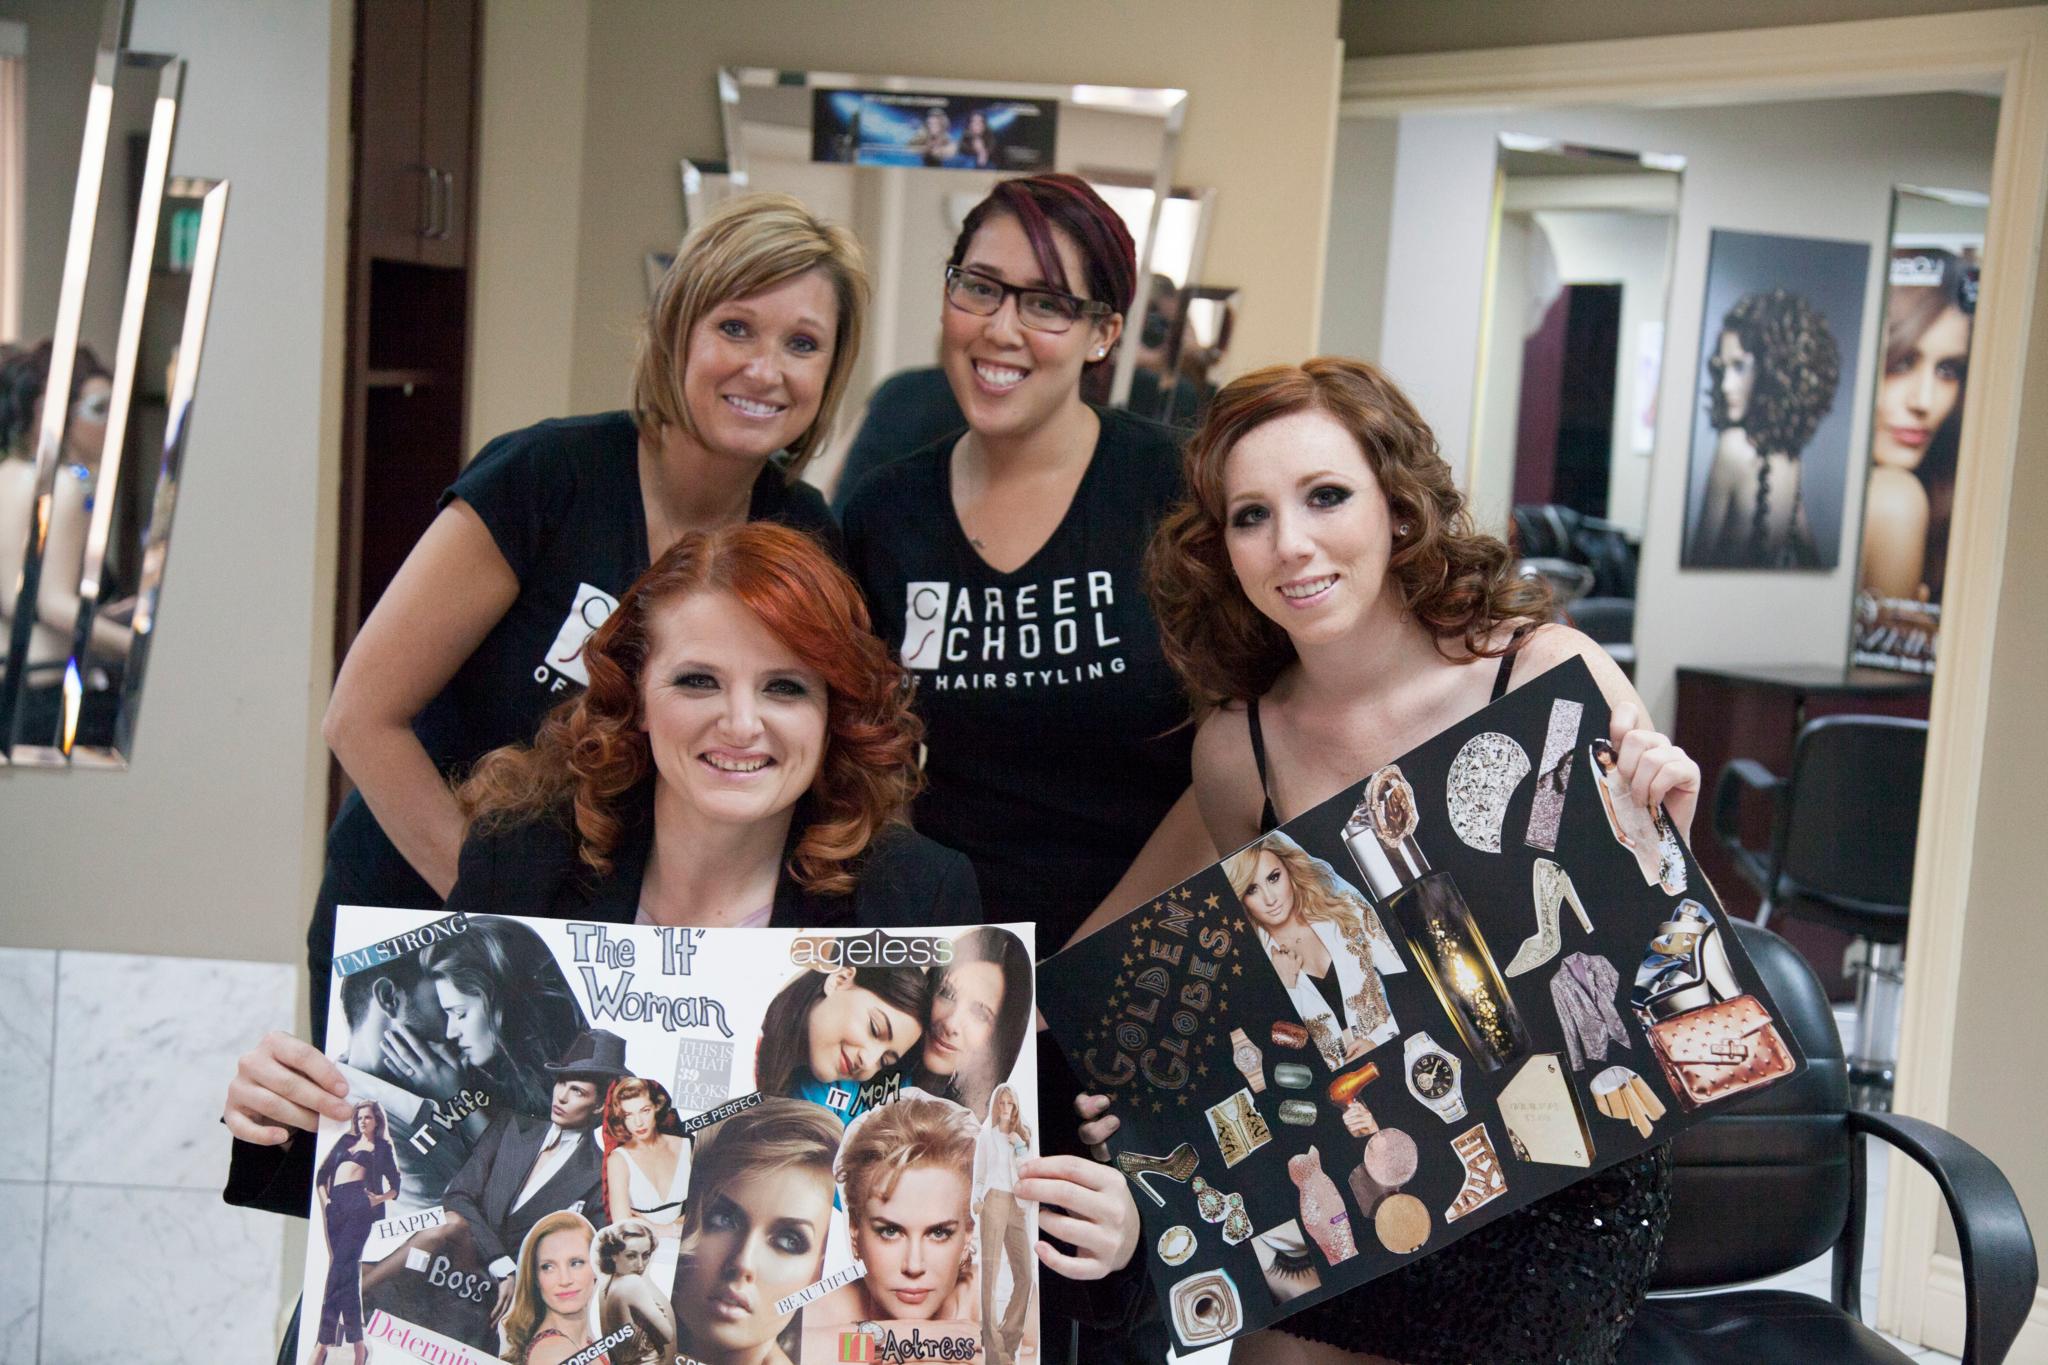 Career School of Hairstyling